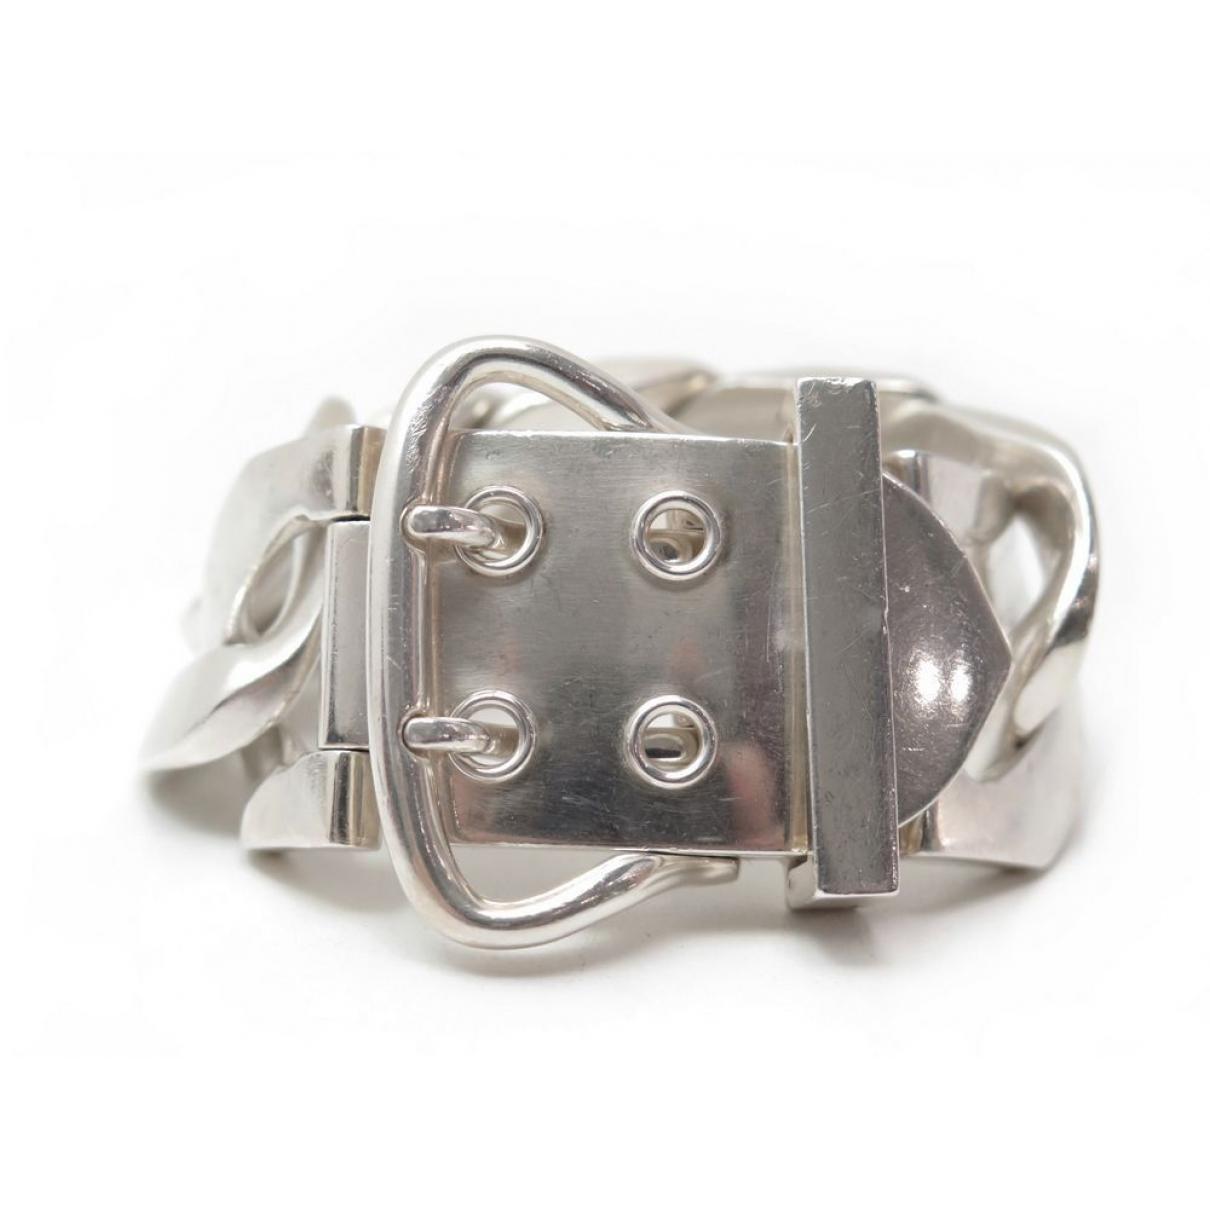 Lyst - Hermès Pre-owned Ceinture Silver Bracelet in Metallic bc961d2f538